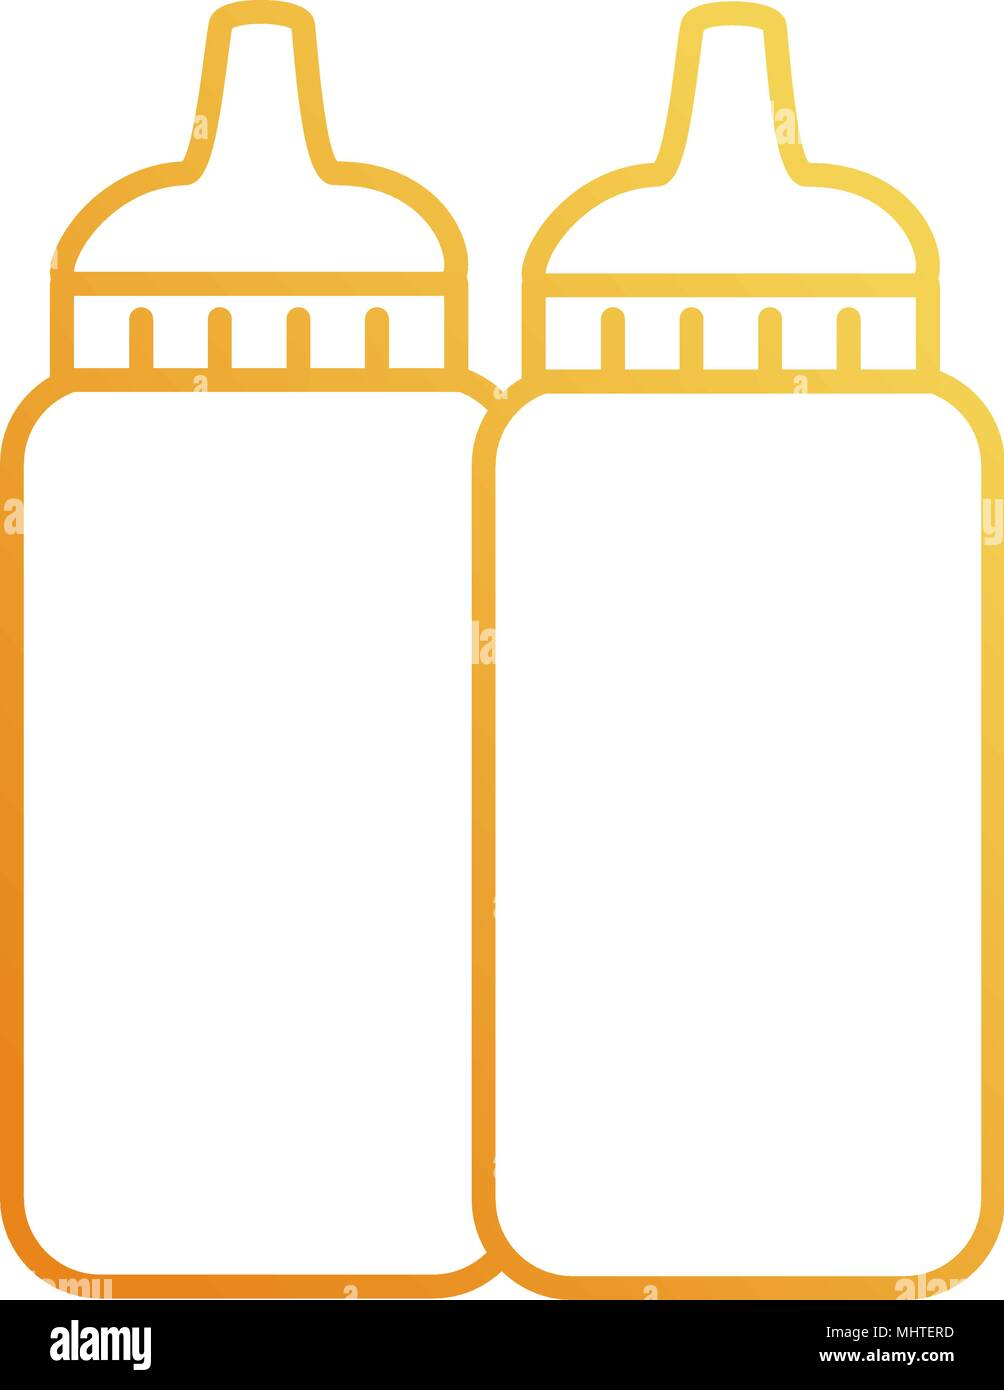 Honey Mustard Stock Vector Images Alamy Mps Whitehoney Sauce Bottles Plastic Icon